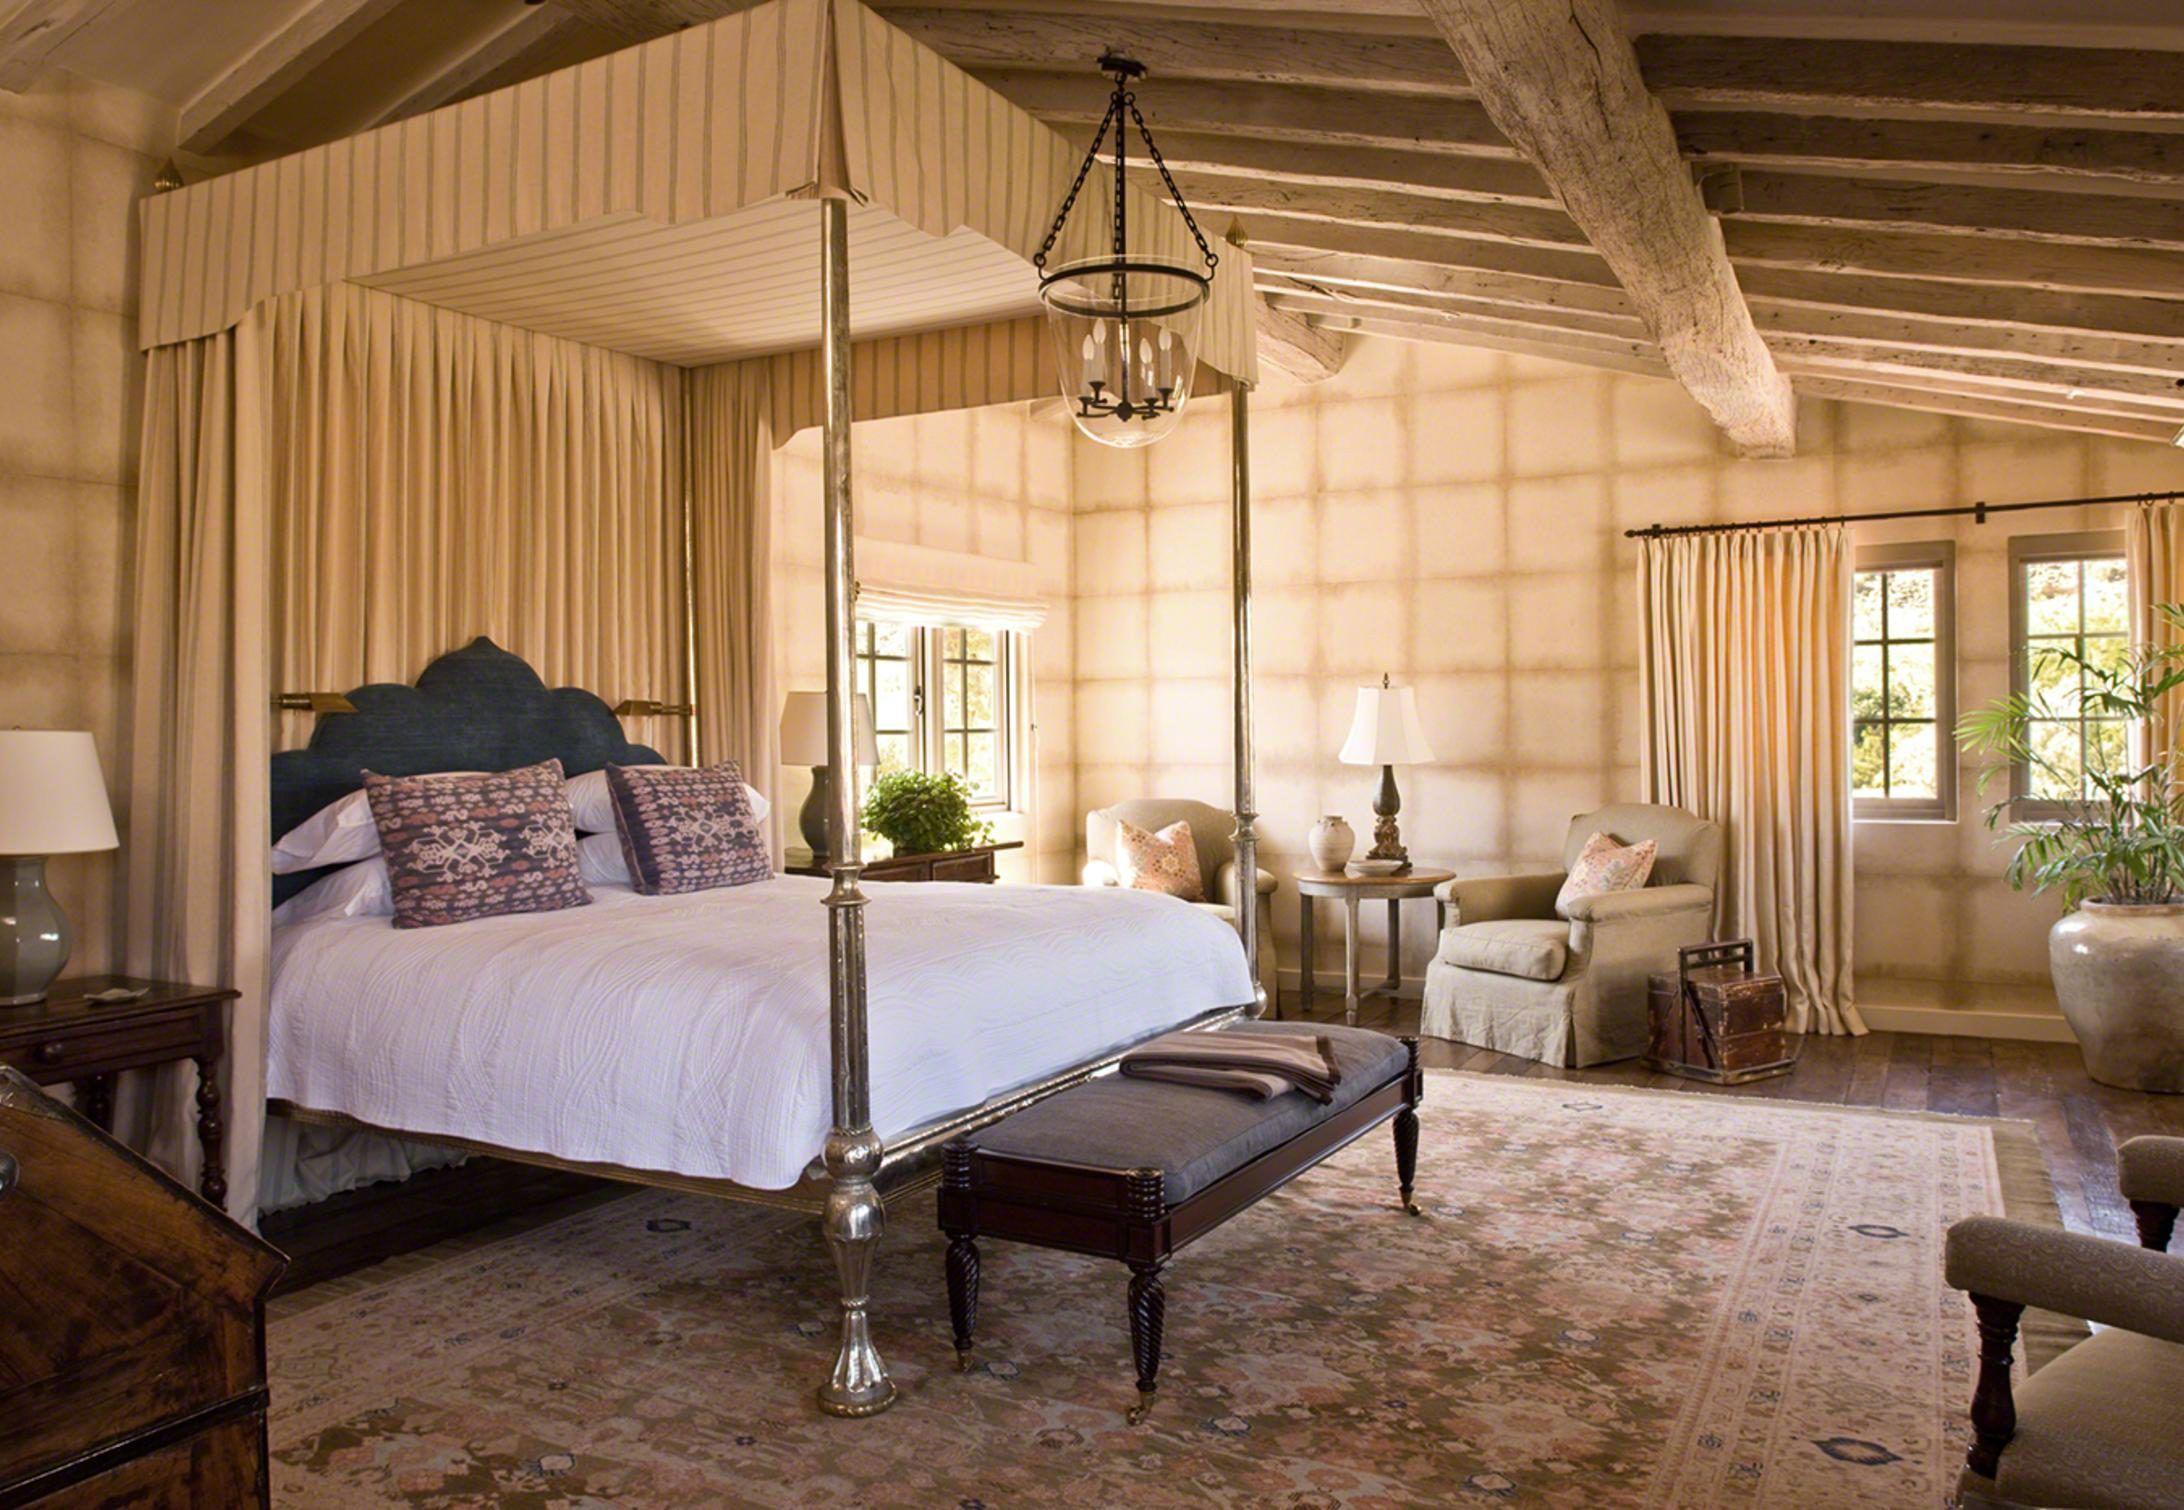 Private Residence #1, Paradise Valley, Arizona - Oz Architects